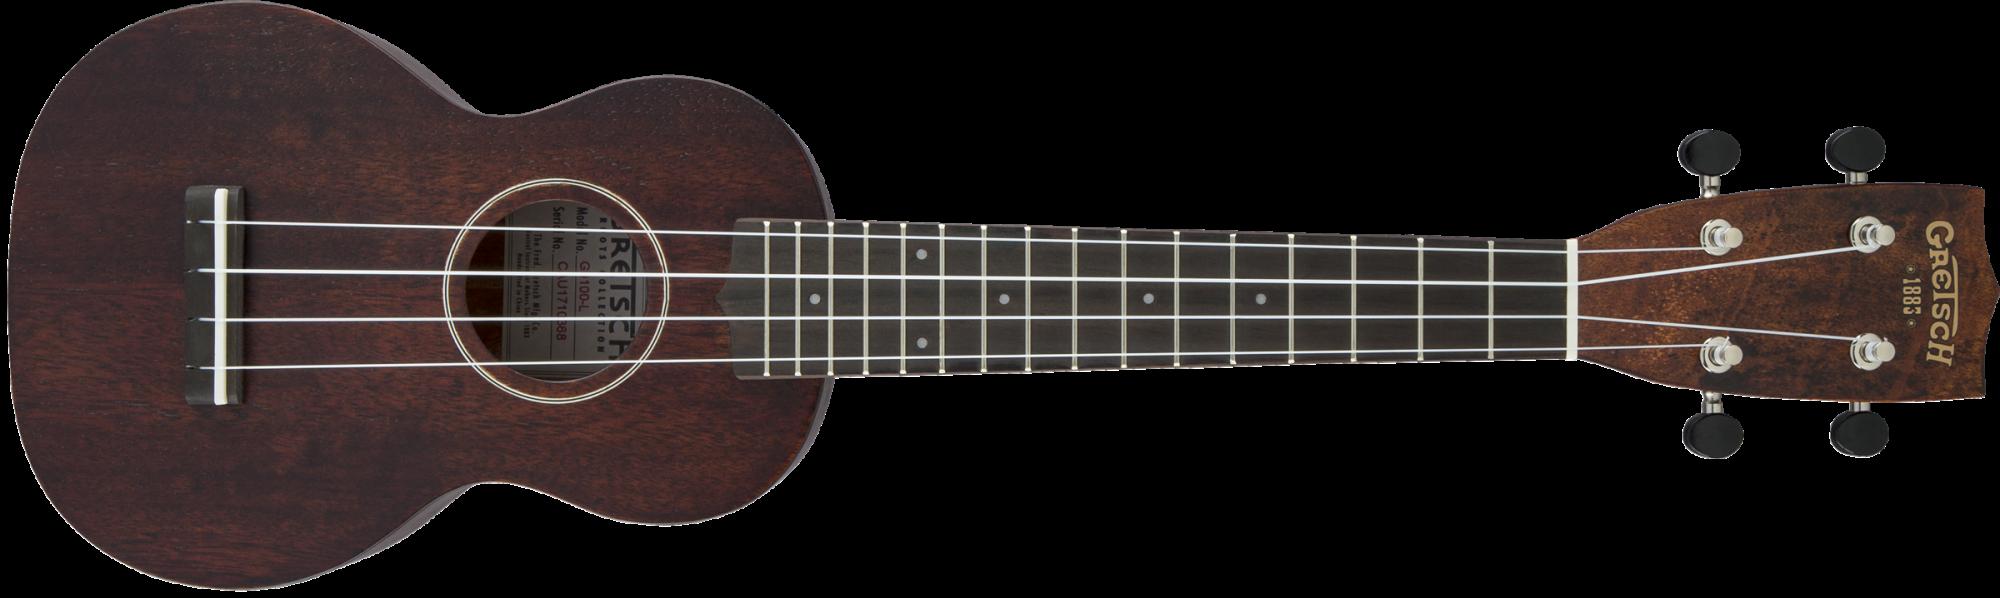 Gretsch G9100-L Soprano Long-Neck Ukulele with Gig Bag, Ovangkol Fingerboard, Vintage Mahogany Stain